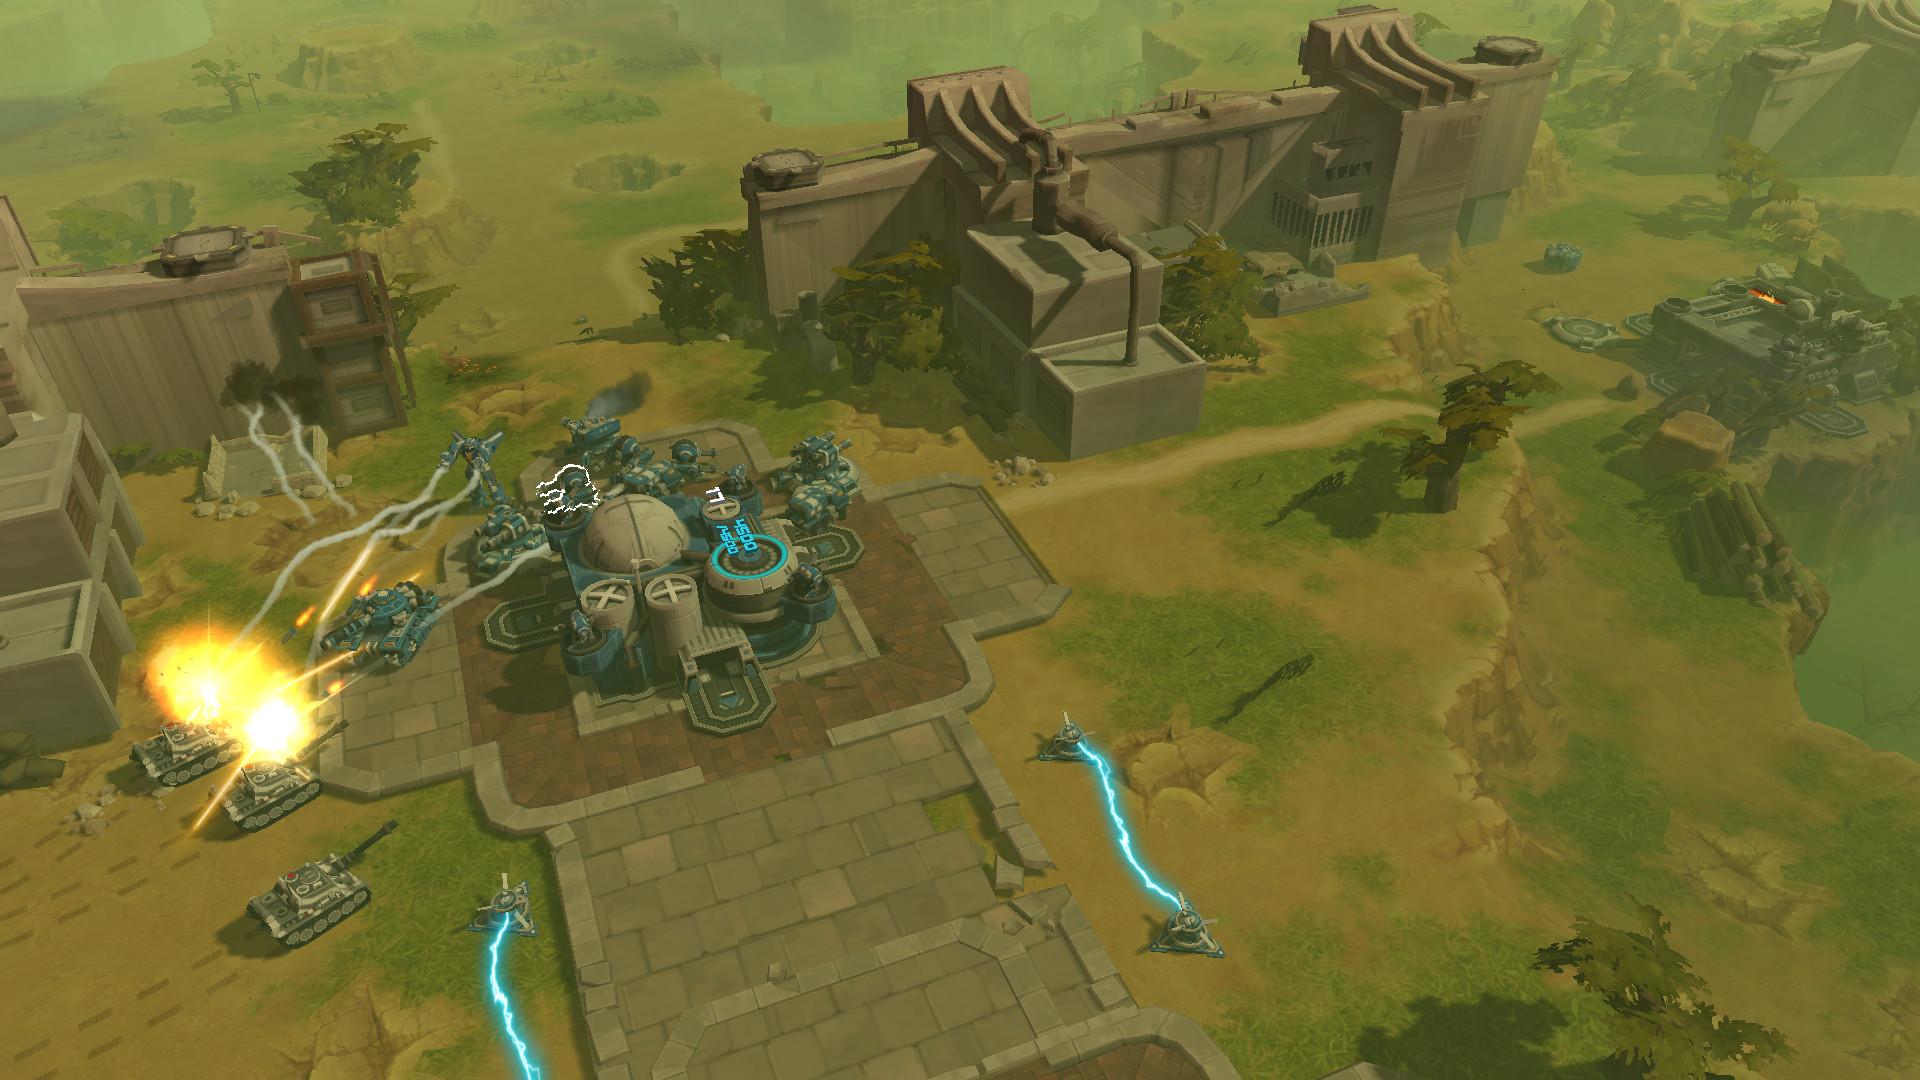 AirMech Wastelands je akční RPG s důrazem na strategické prvky 153282